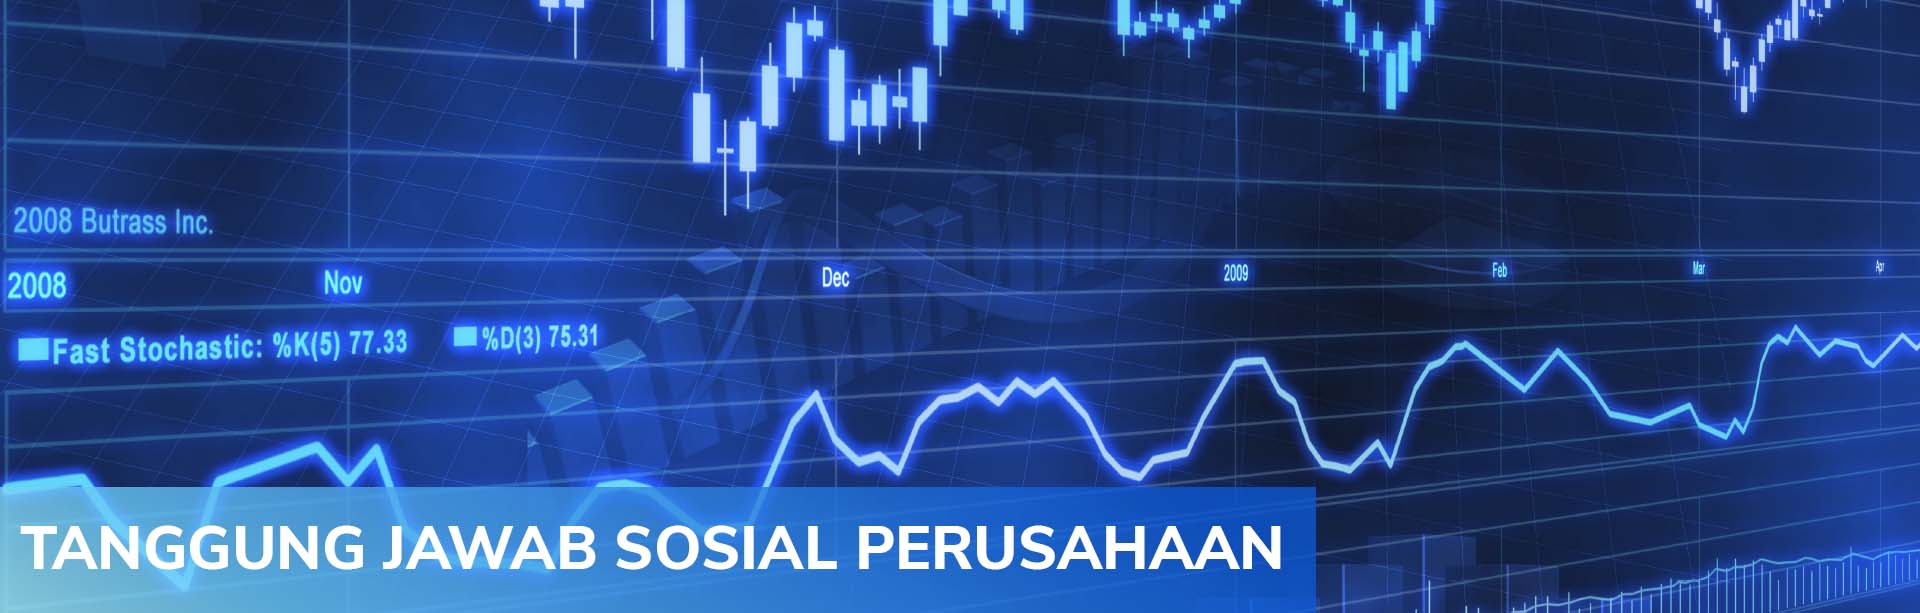 TANGGUNG JAWAB SOCIAL PERUSAHAAN